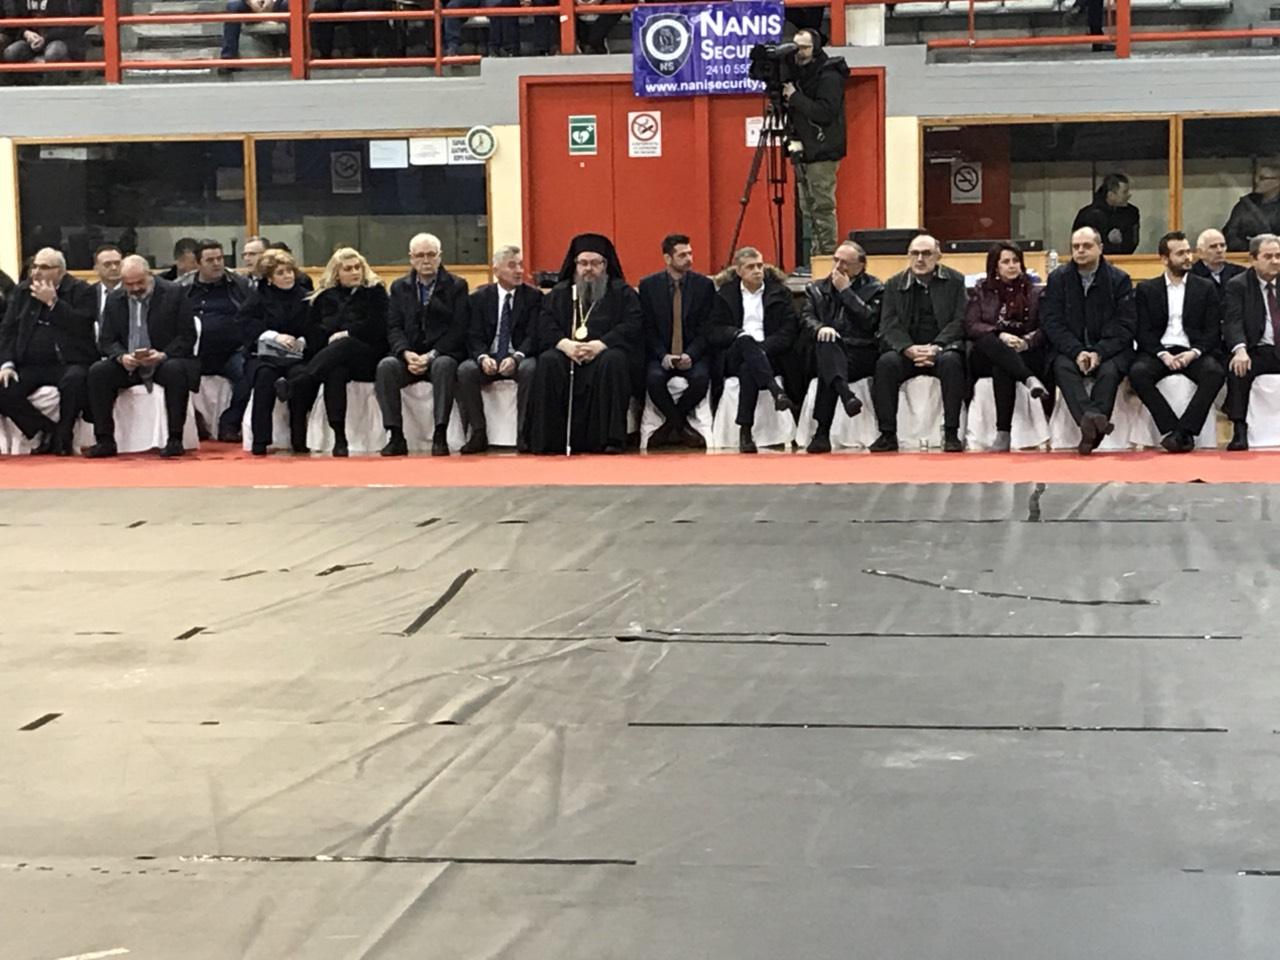 pita sarakatsanaiwn 2019 7 - O Σεβασμιώτατος στο πανελλήνιο αντάμωμα των Σαρακατσαναίων.